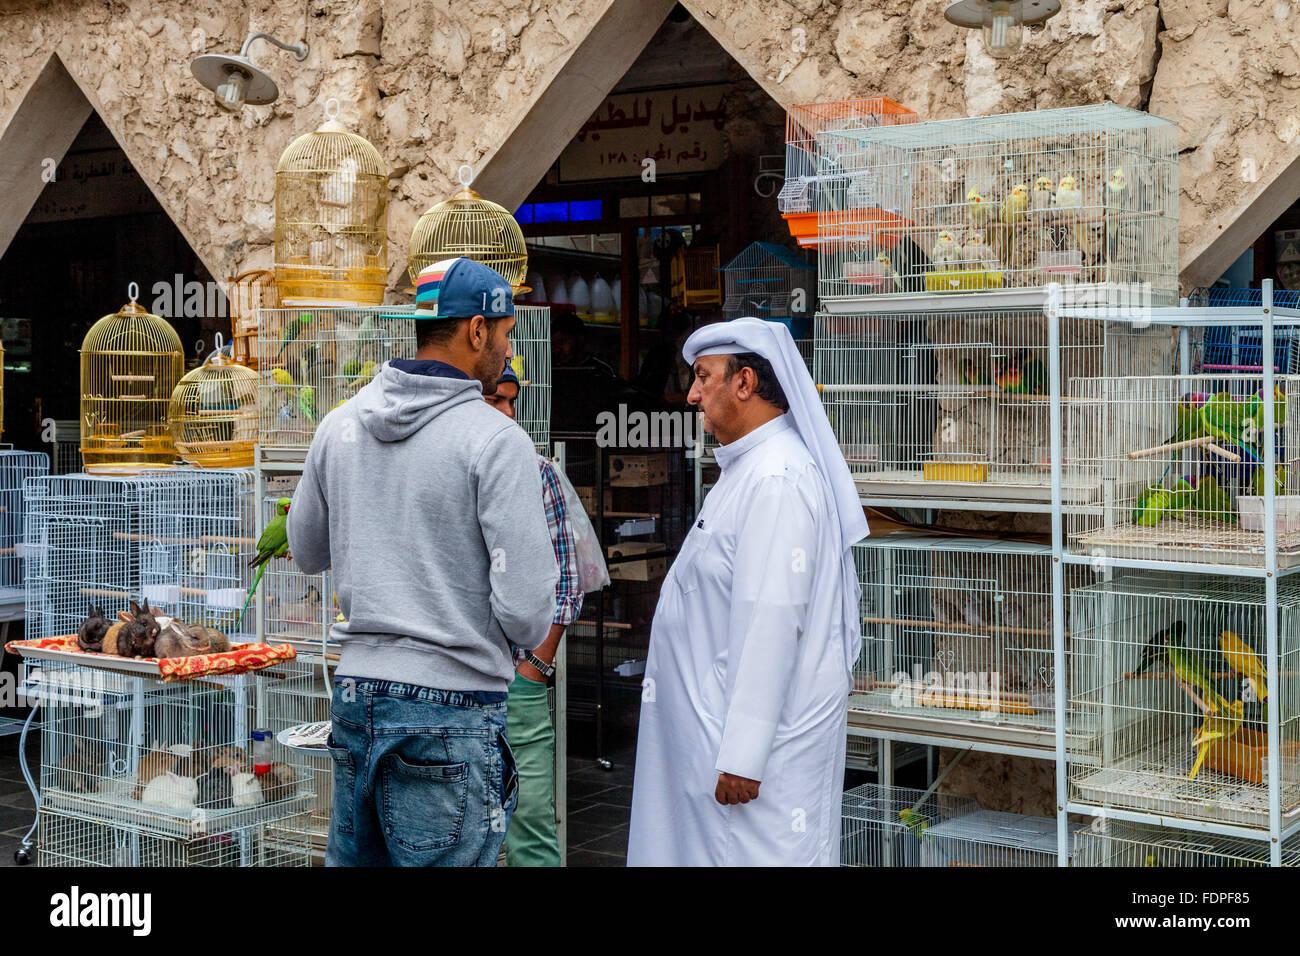 The Bird Market At Souk Waqif, Doha, Qatar - Stock Image